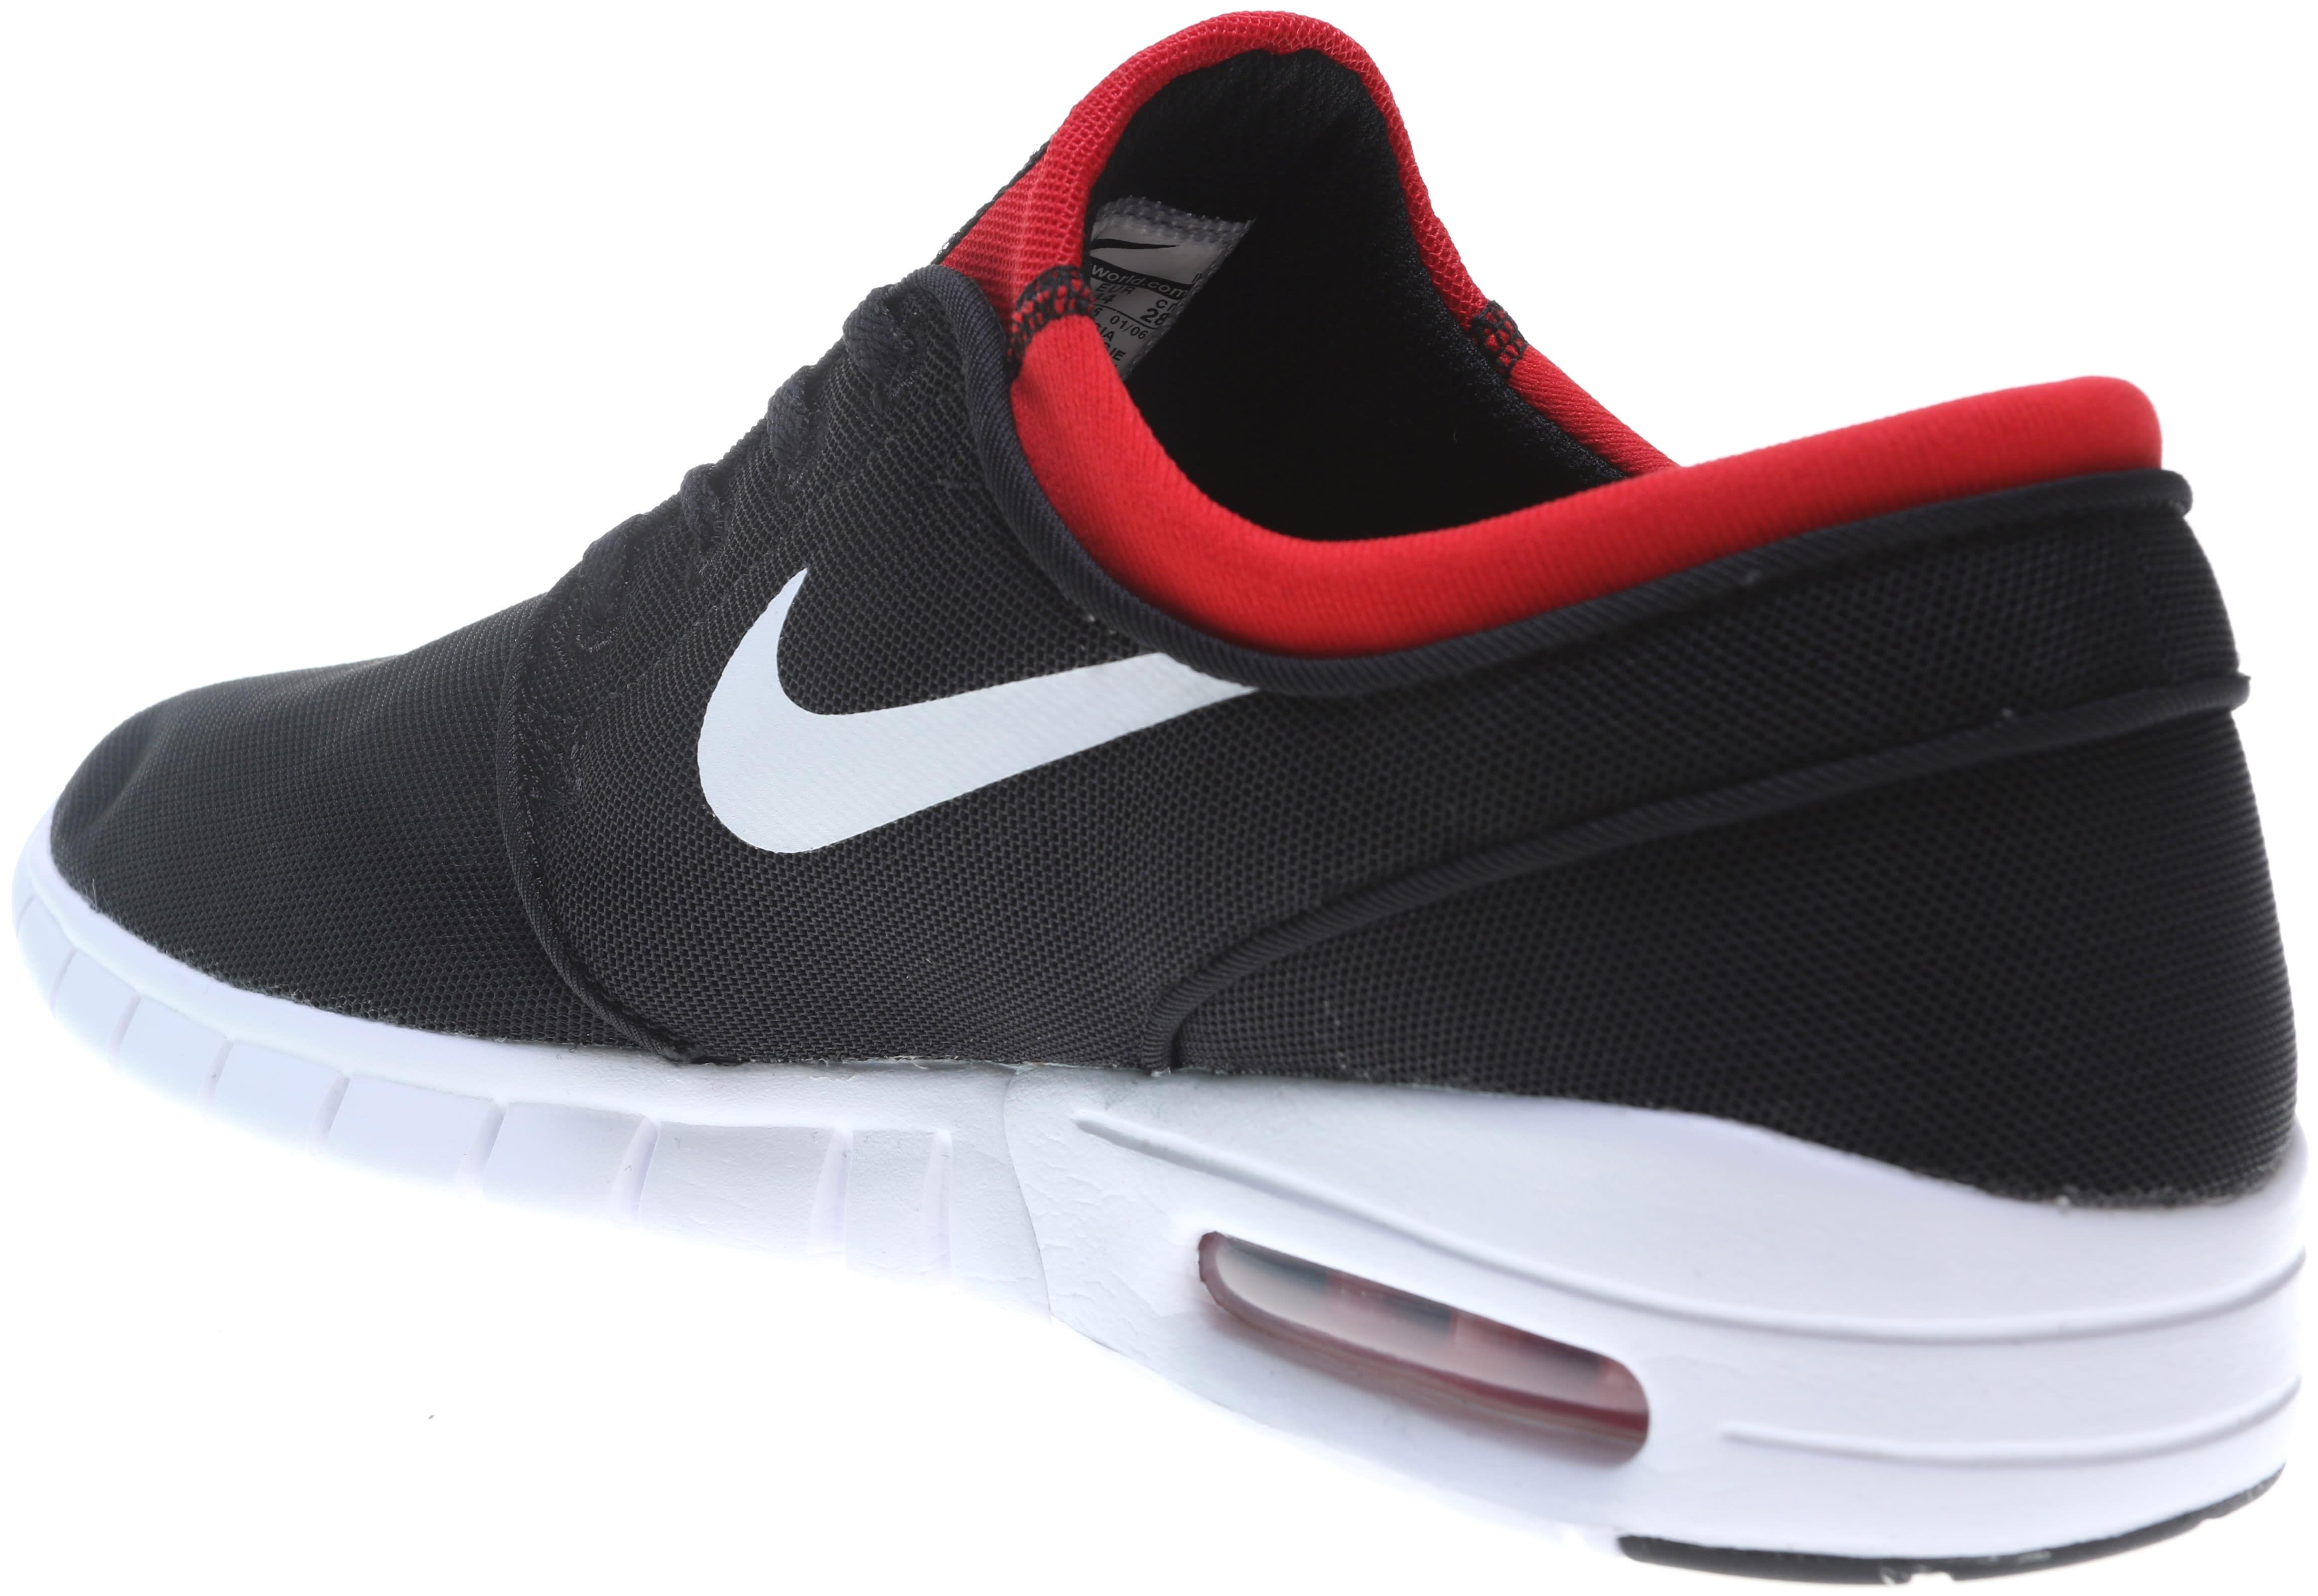 Nike Stefan Janoski Max Skate Shoes - thumbnail 3